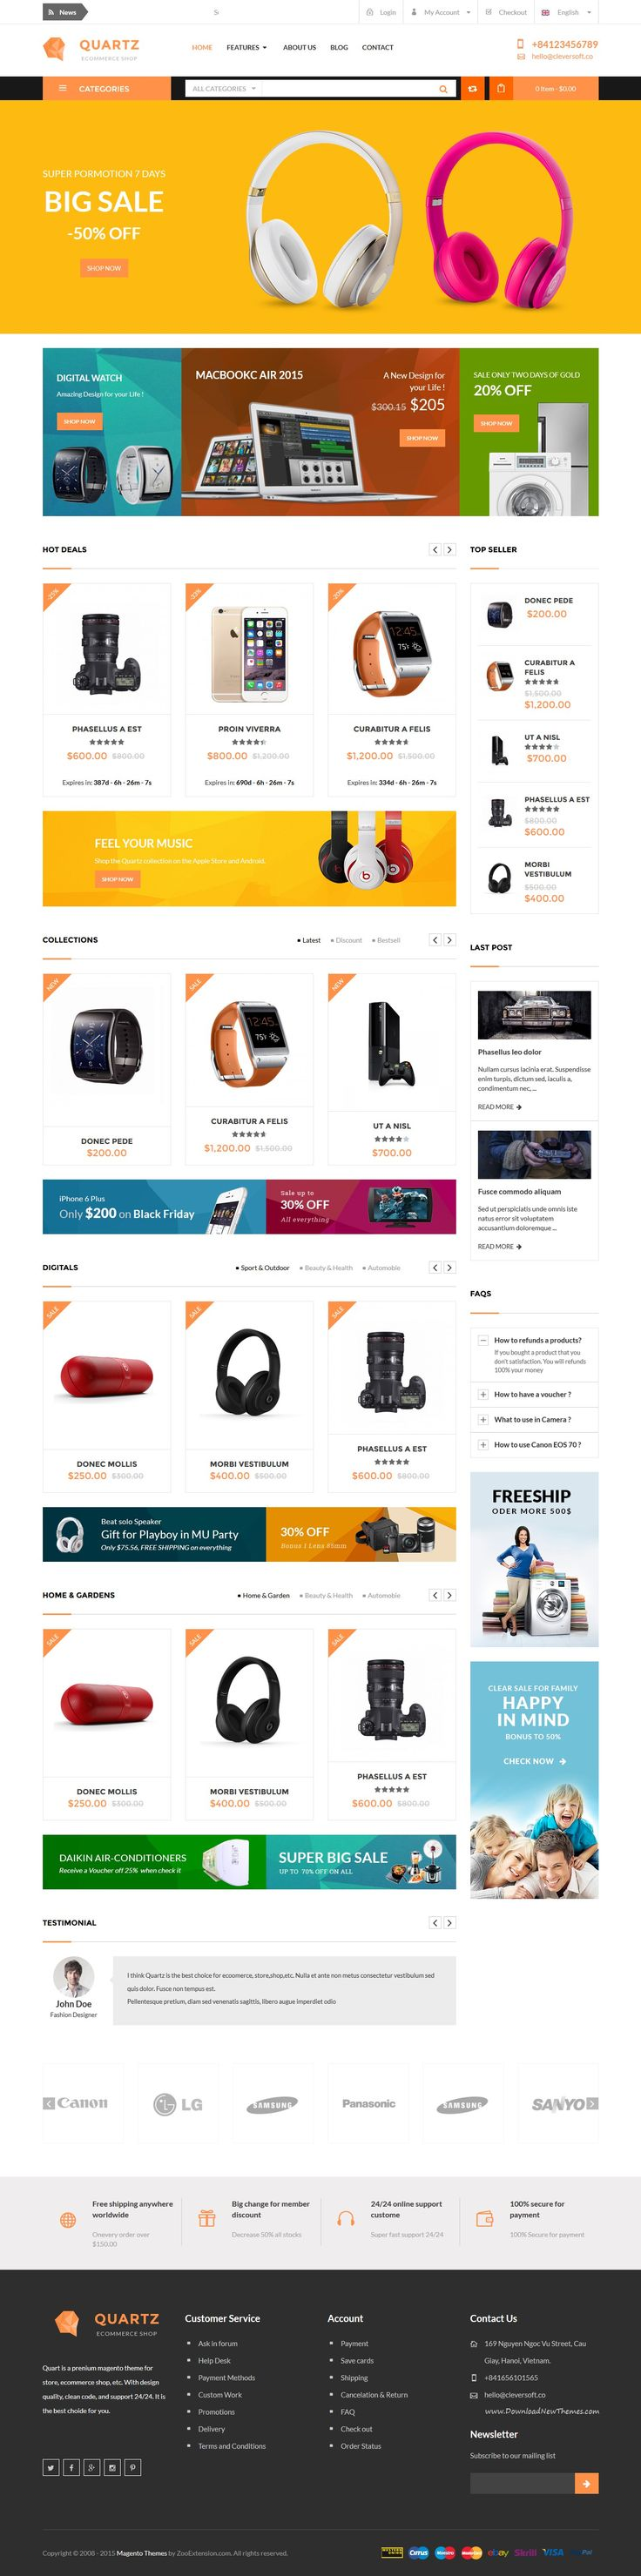 Quartz is premium responsive magento theme #digital #electronics #eCommerce…